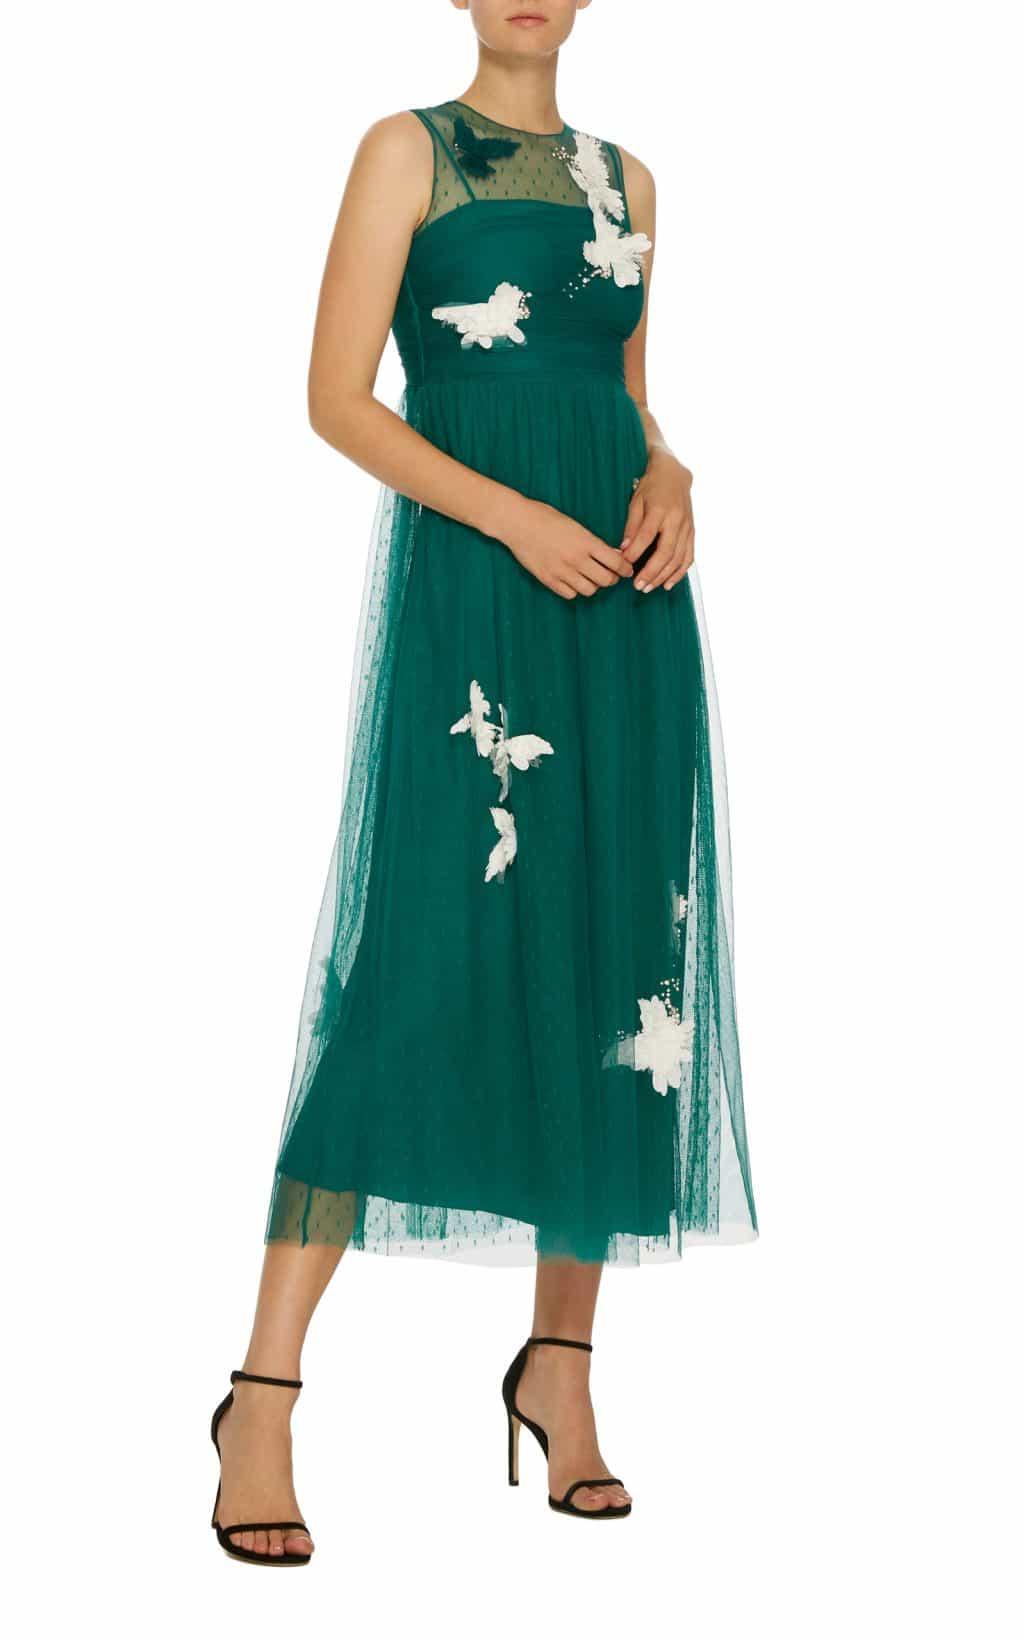 RED VALENTINO Point D'Esprit Sleeveless Midi Green Dress